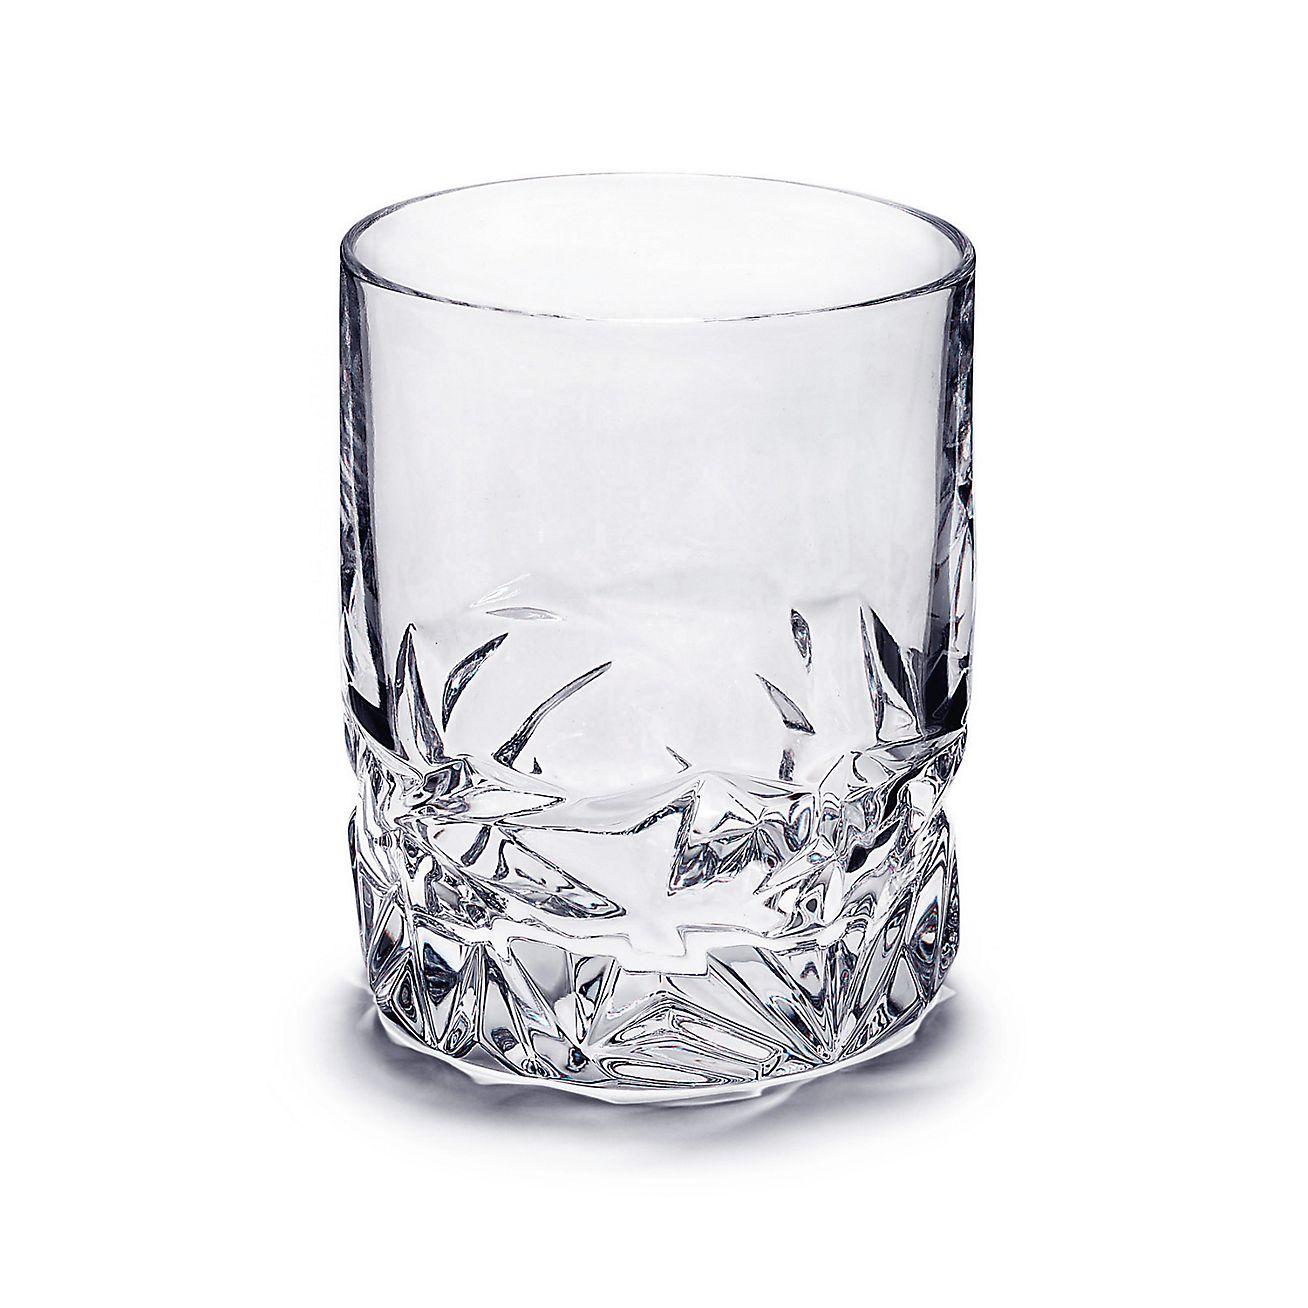 Rock Cut Double Old Fashioned Glass In Crystal.   Tiffany U0026 Co.